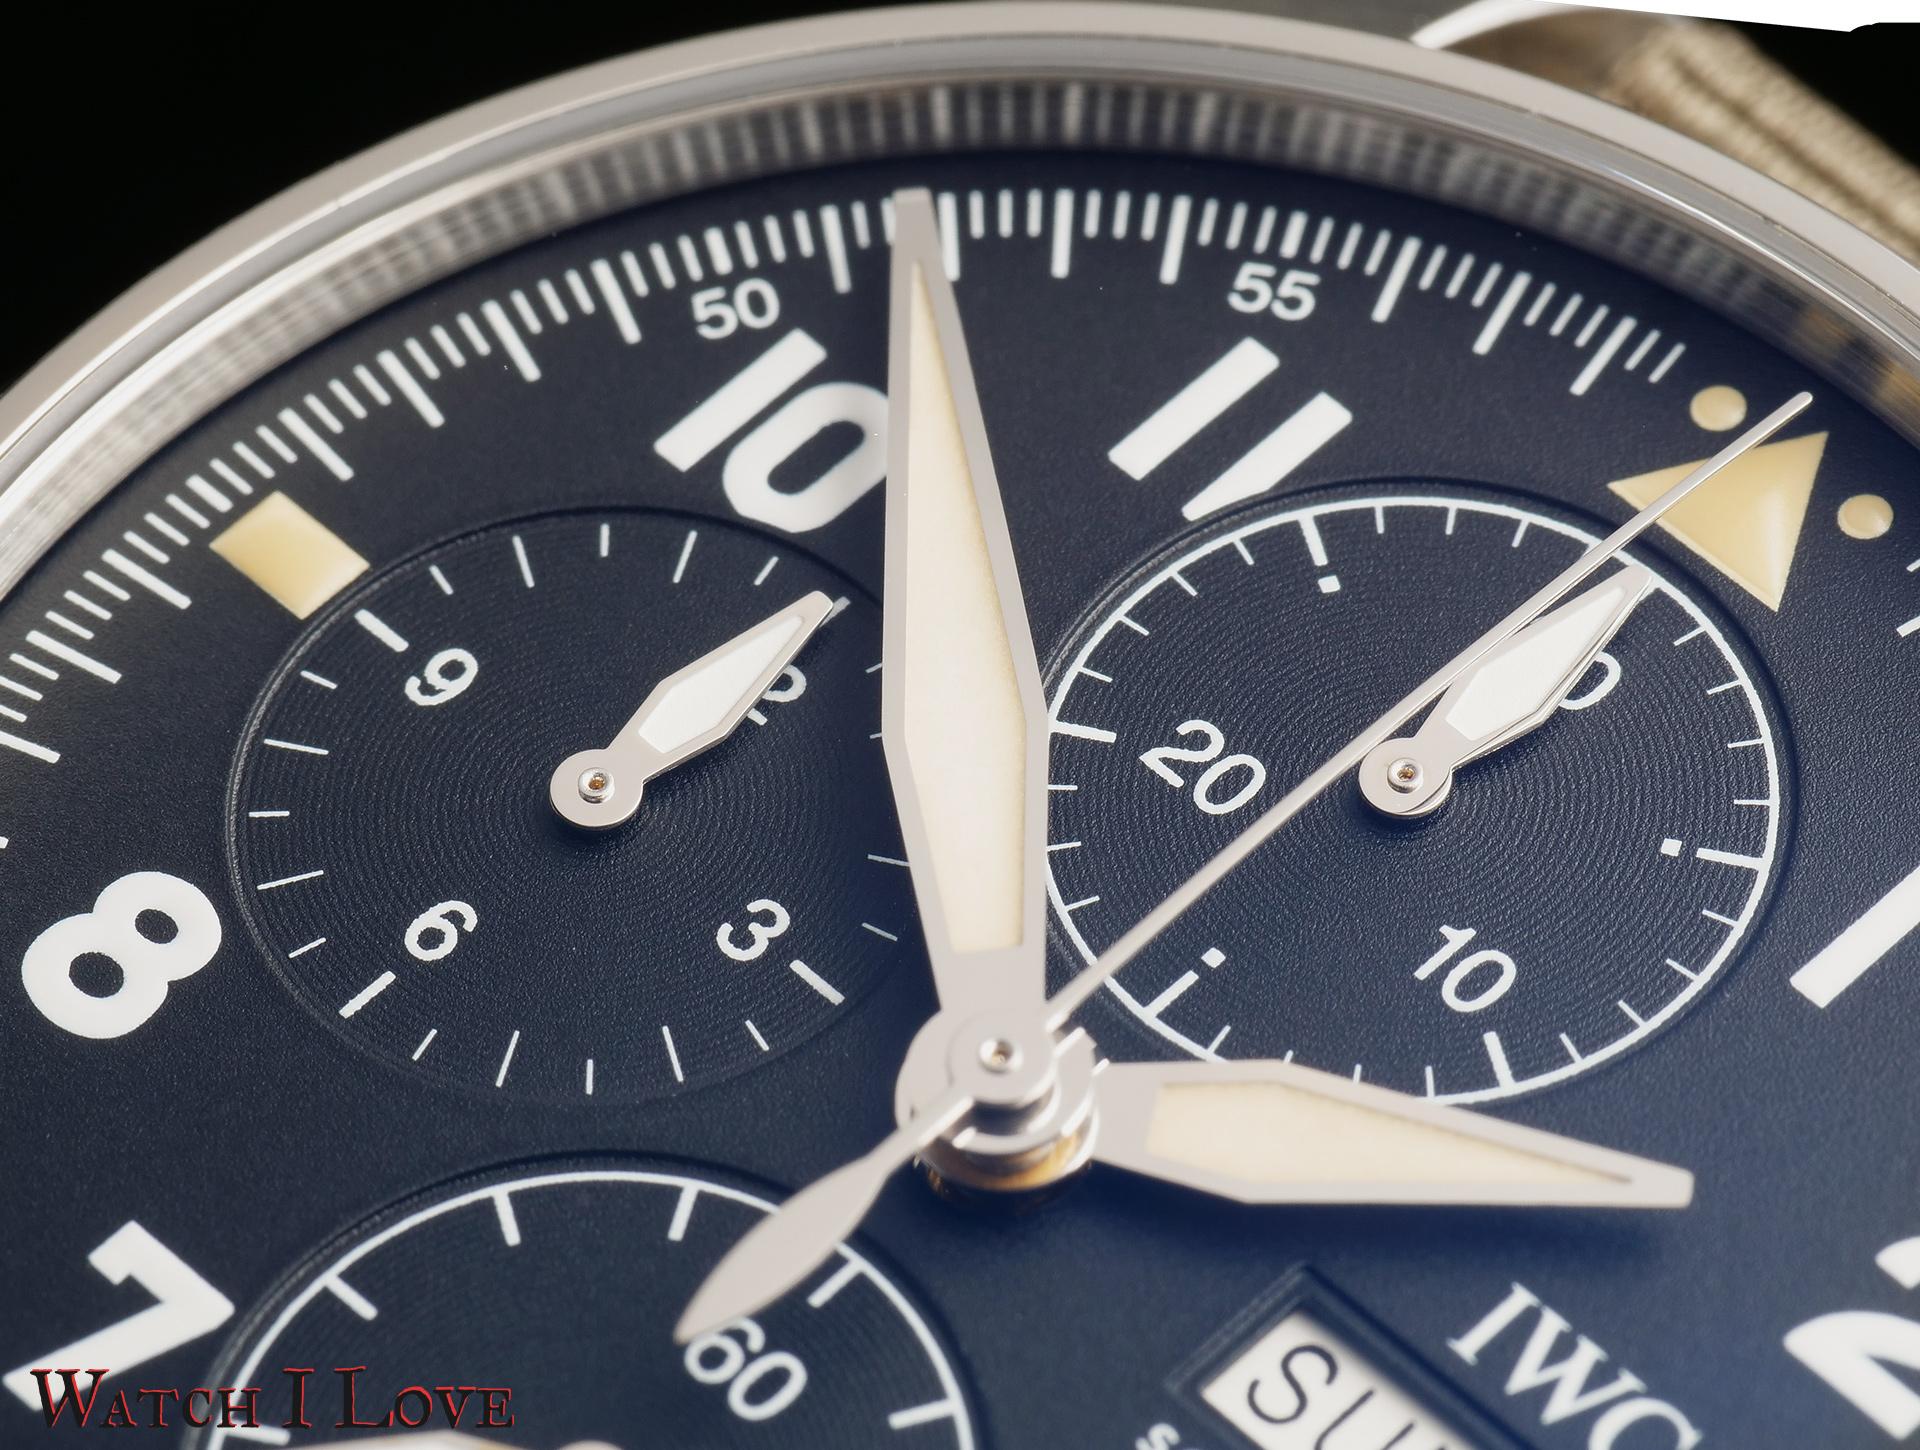 Chrono dials of the Spitfire Chrono